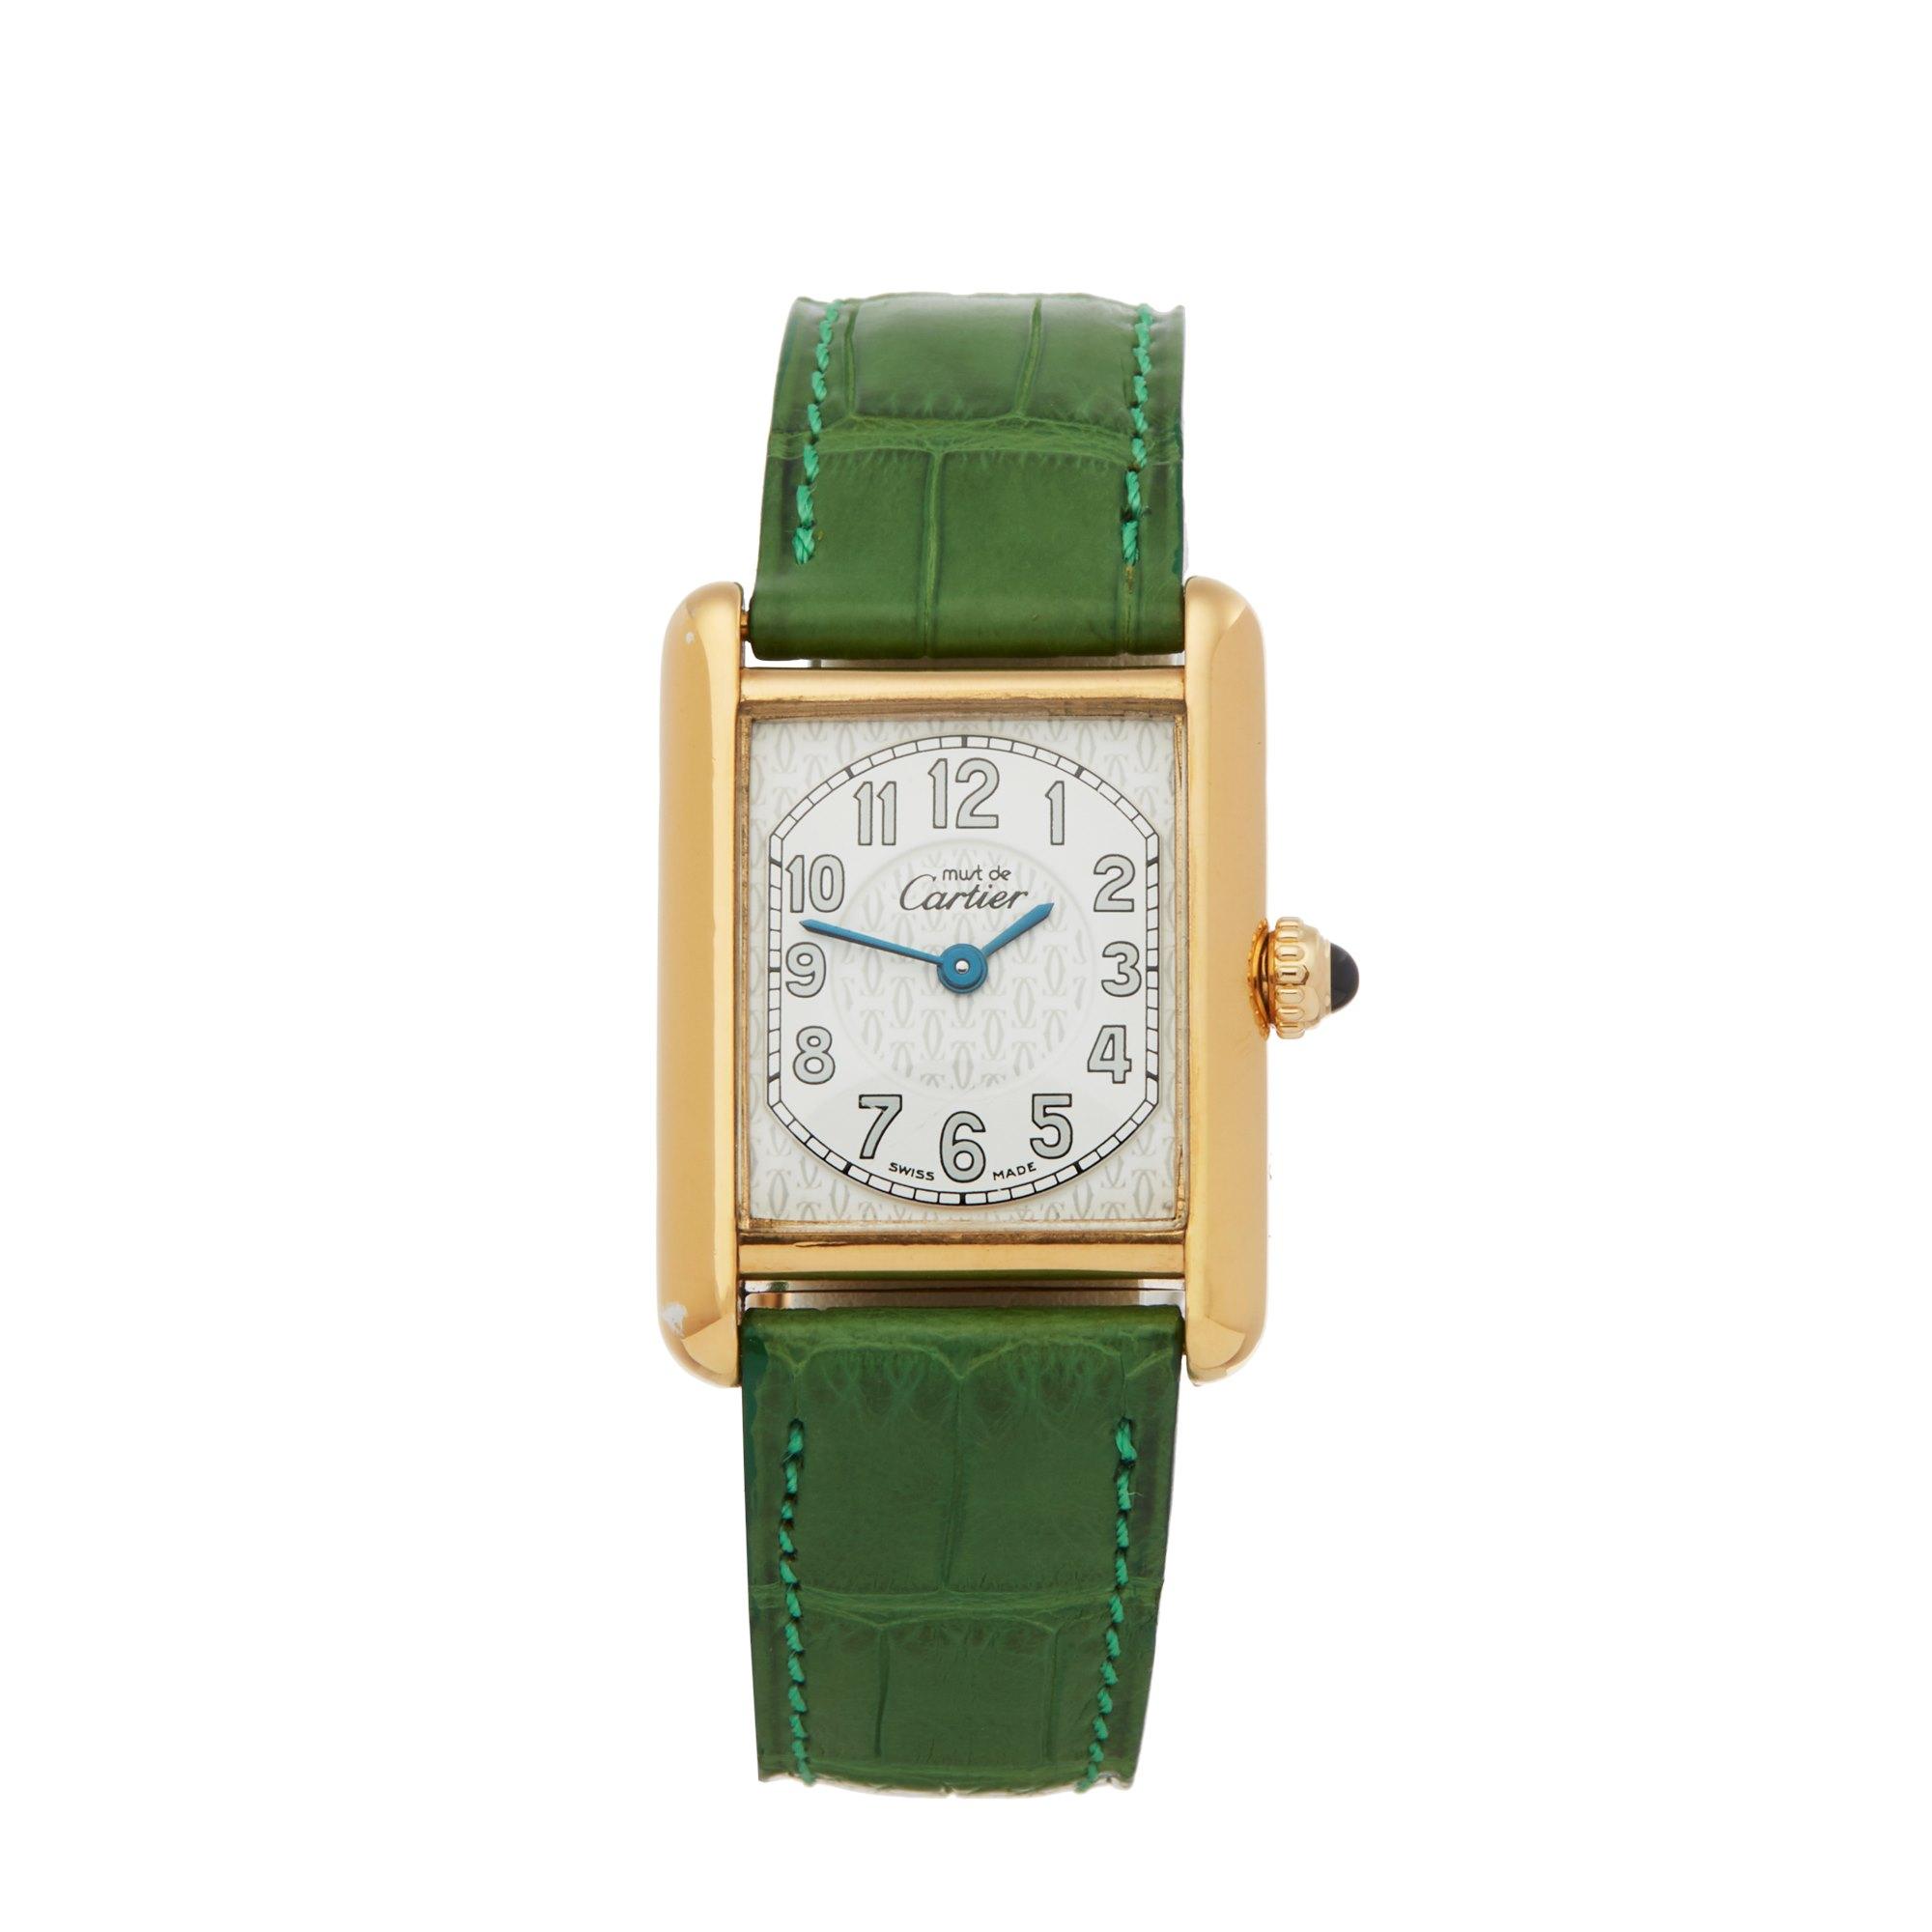 Cartier Must de Cartier 2415 Men Gold Plated Watch - Image 2 of 6